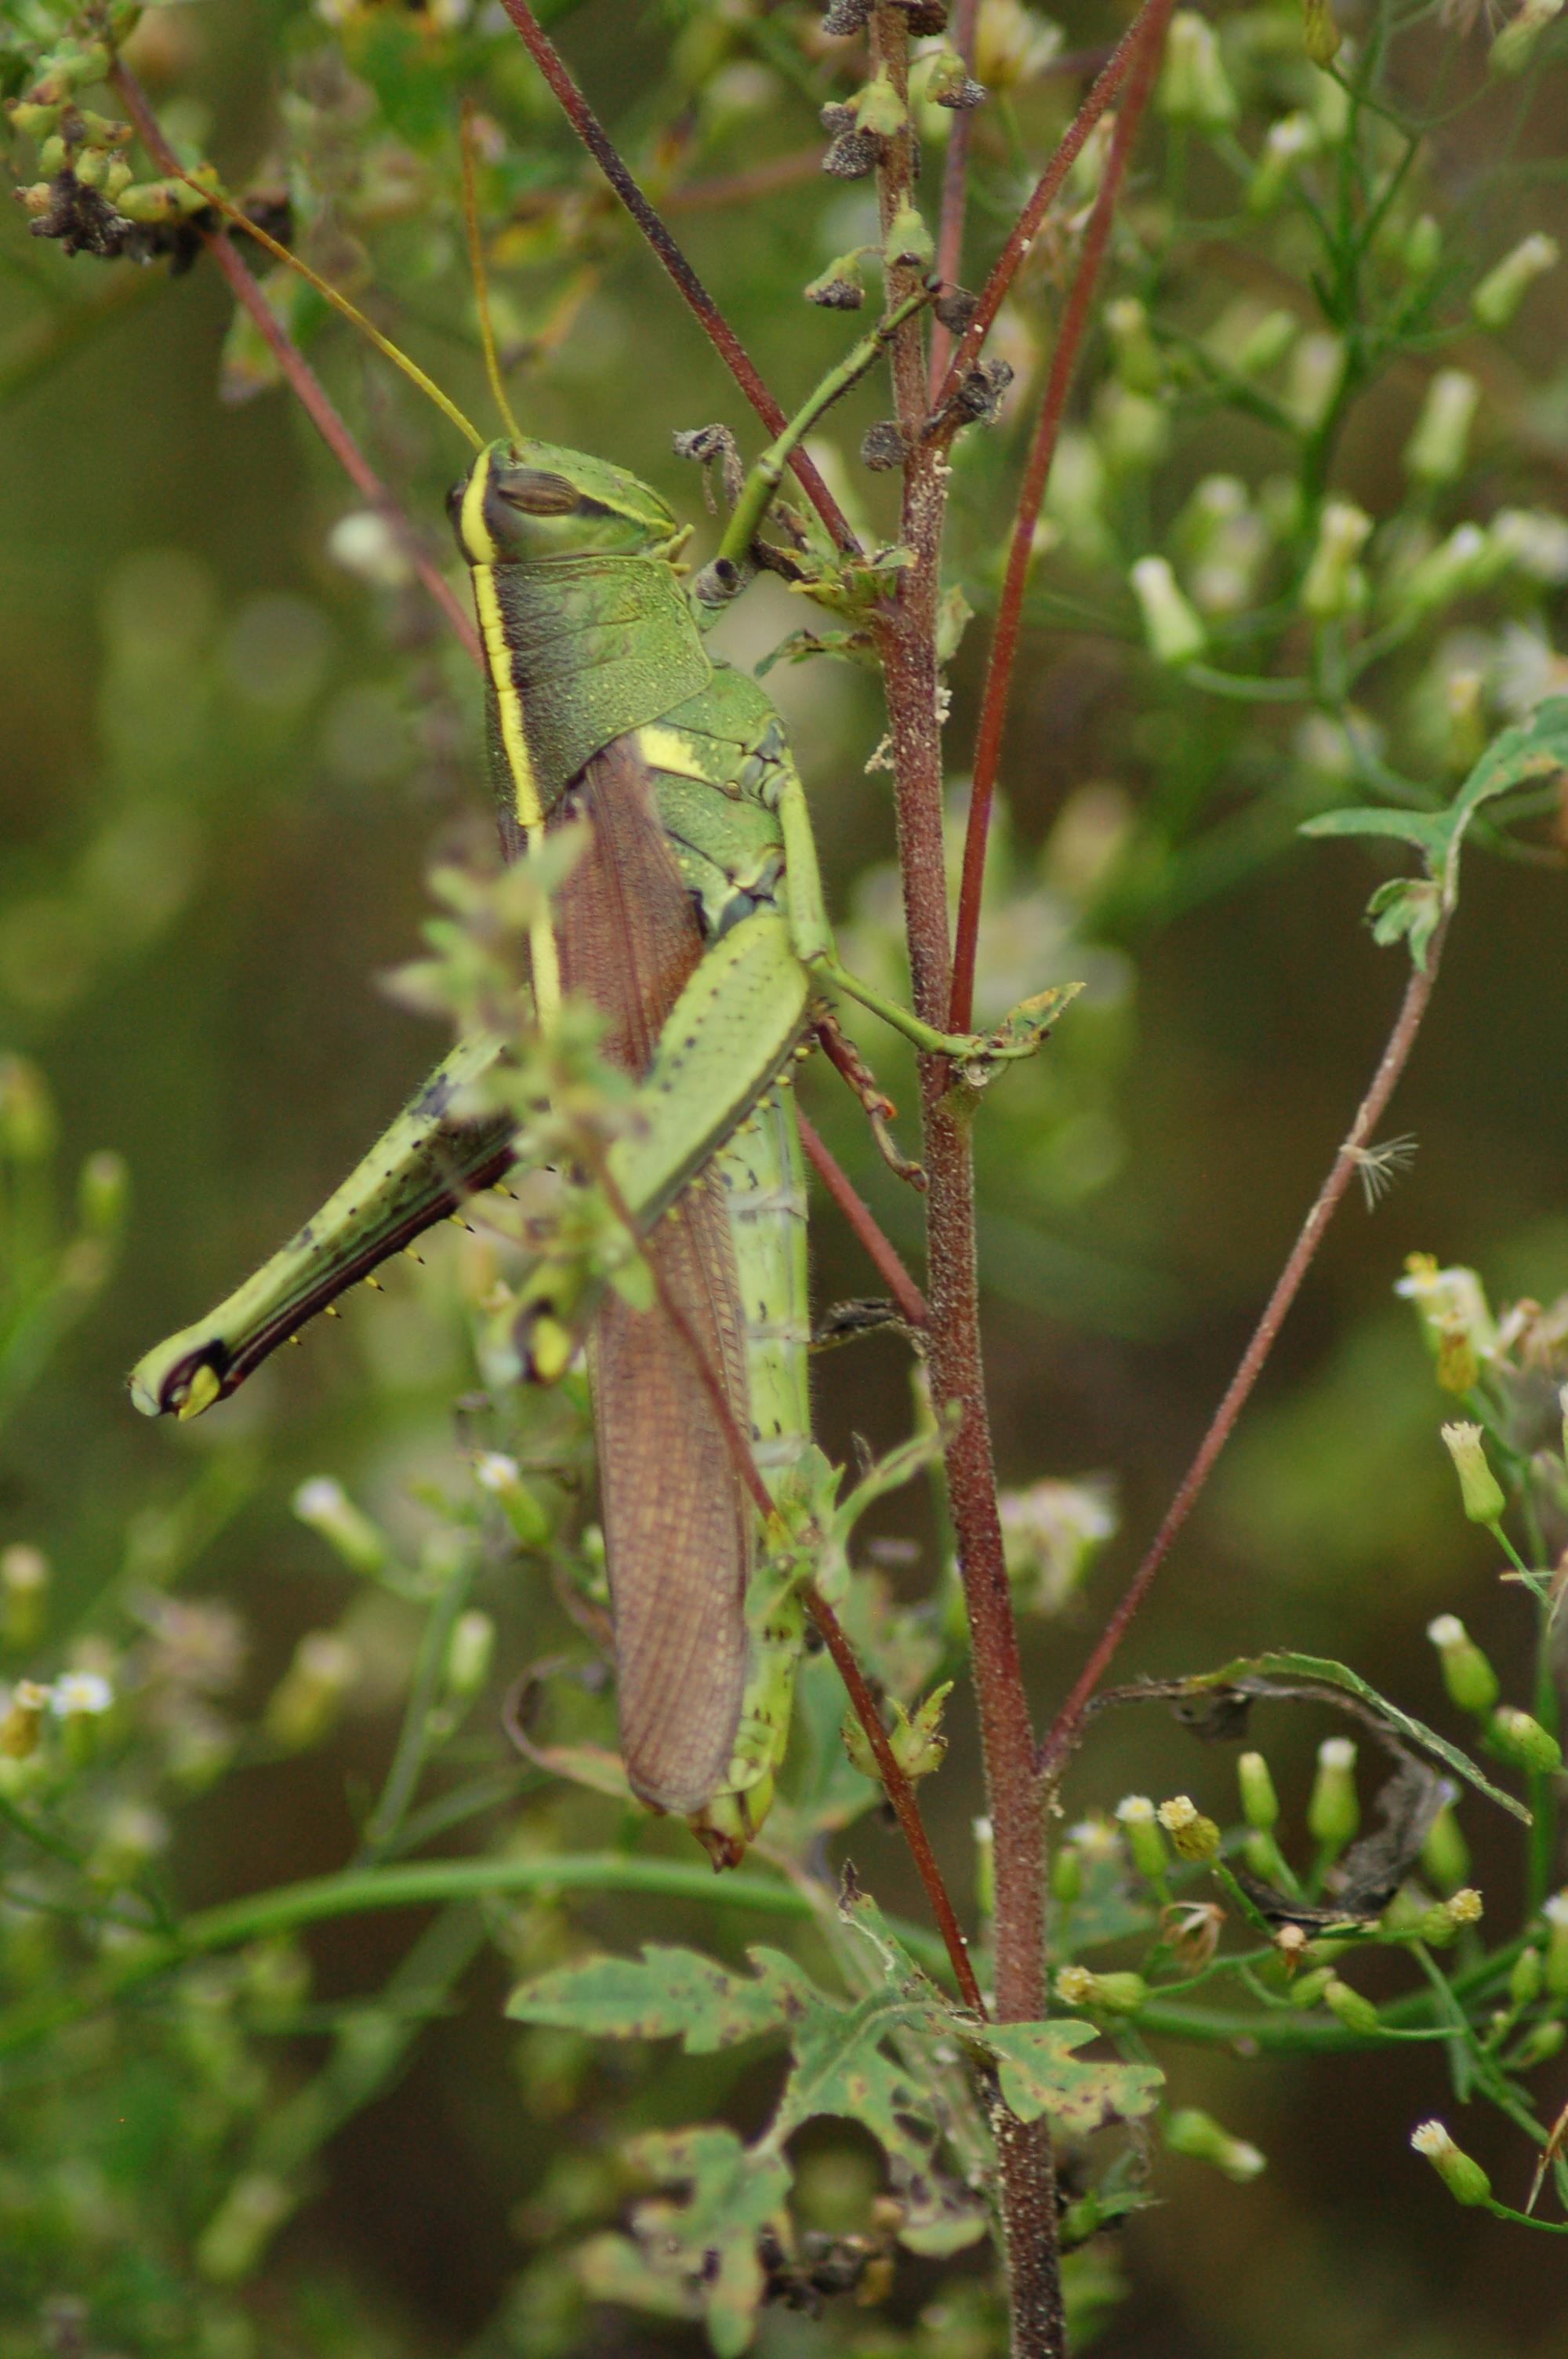 stock-photos-nature-linda-bateman-grasshopper